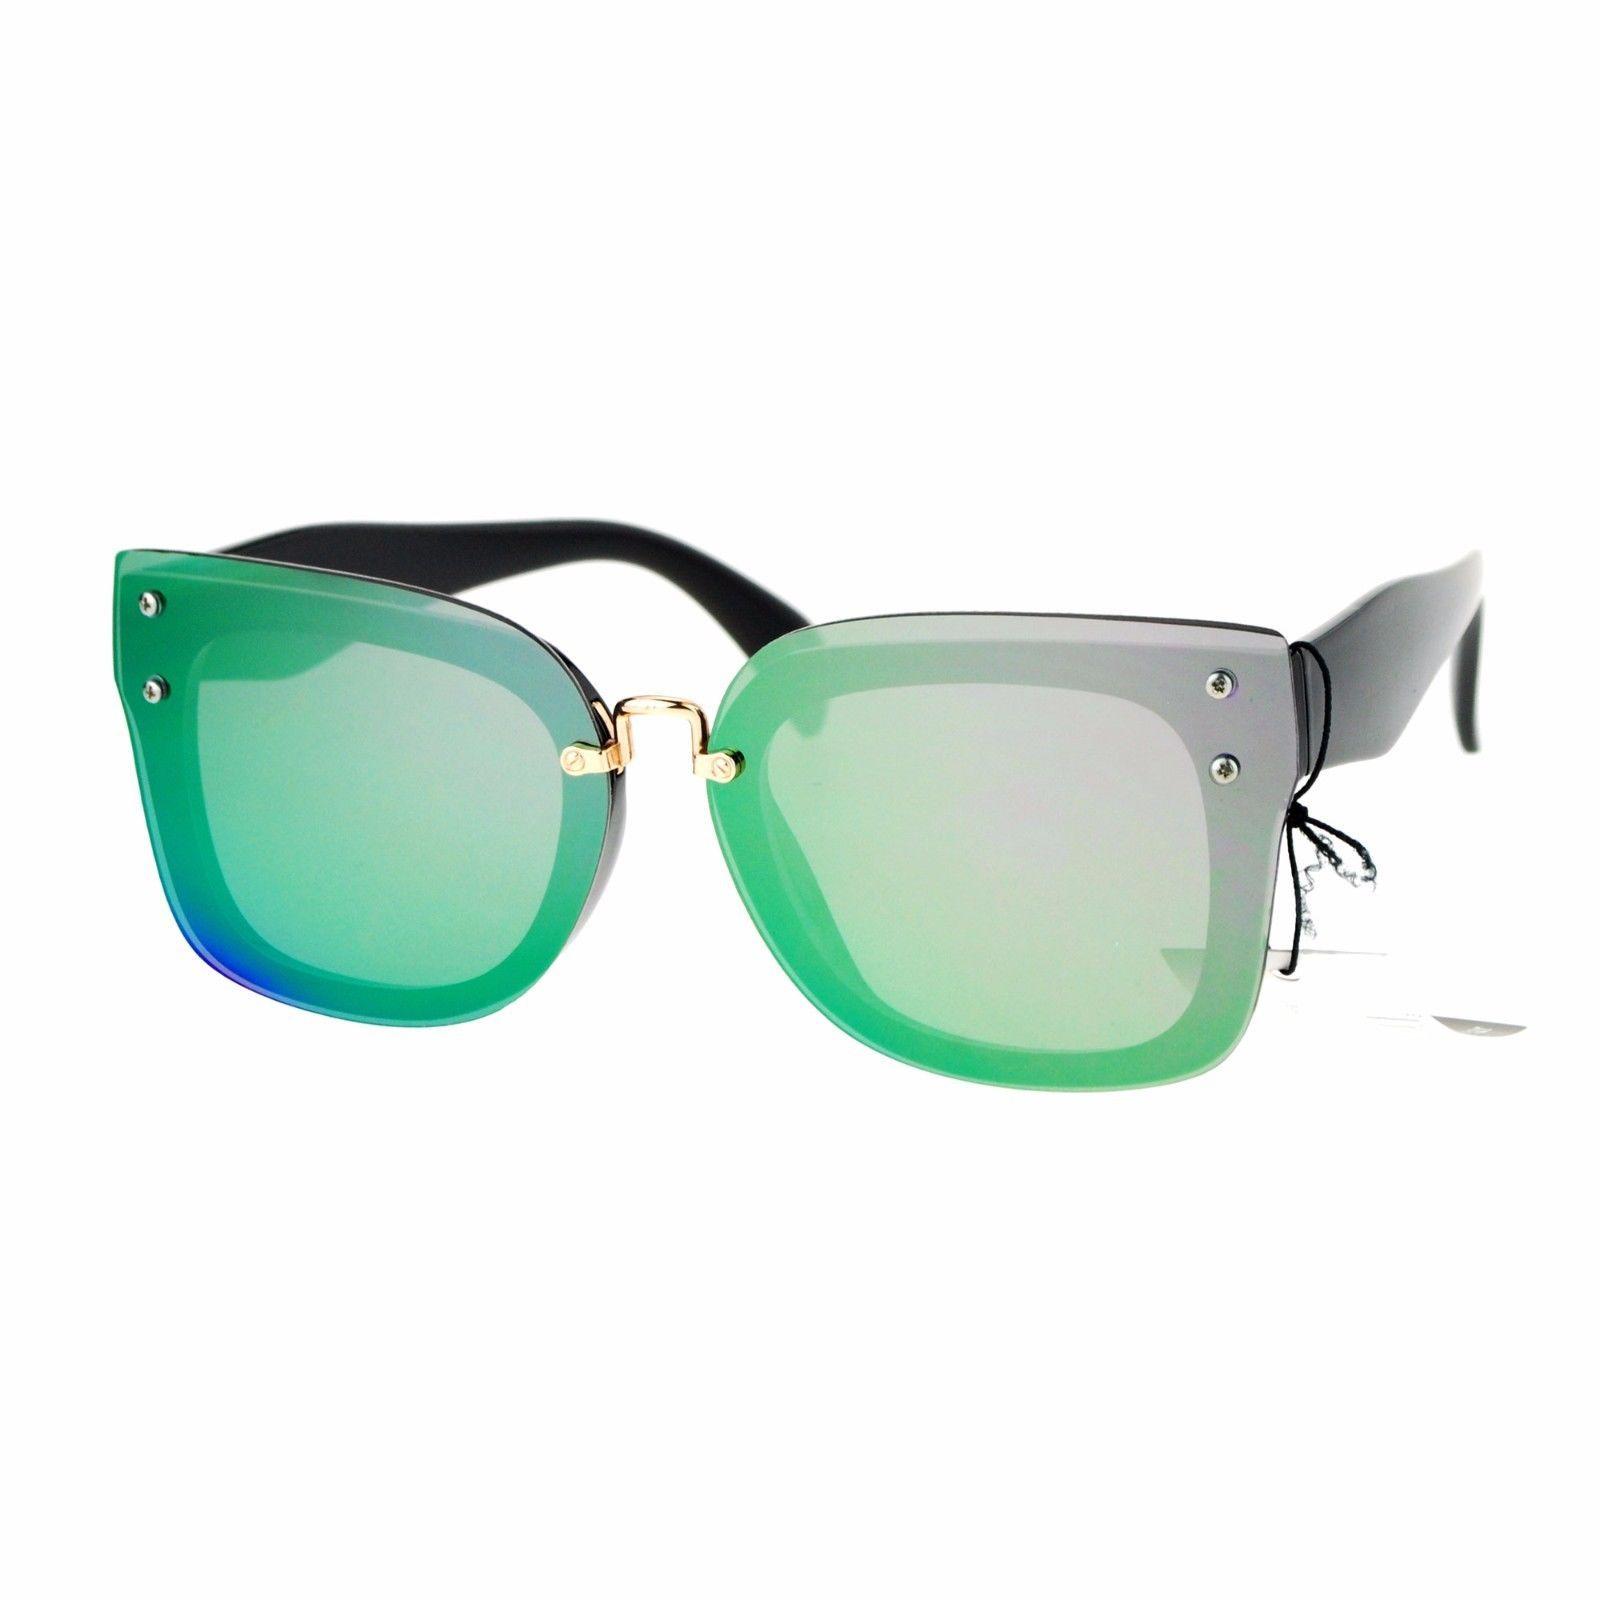 Rims Behind Lens Sunglasses Womens Square Designer Fashion Shades